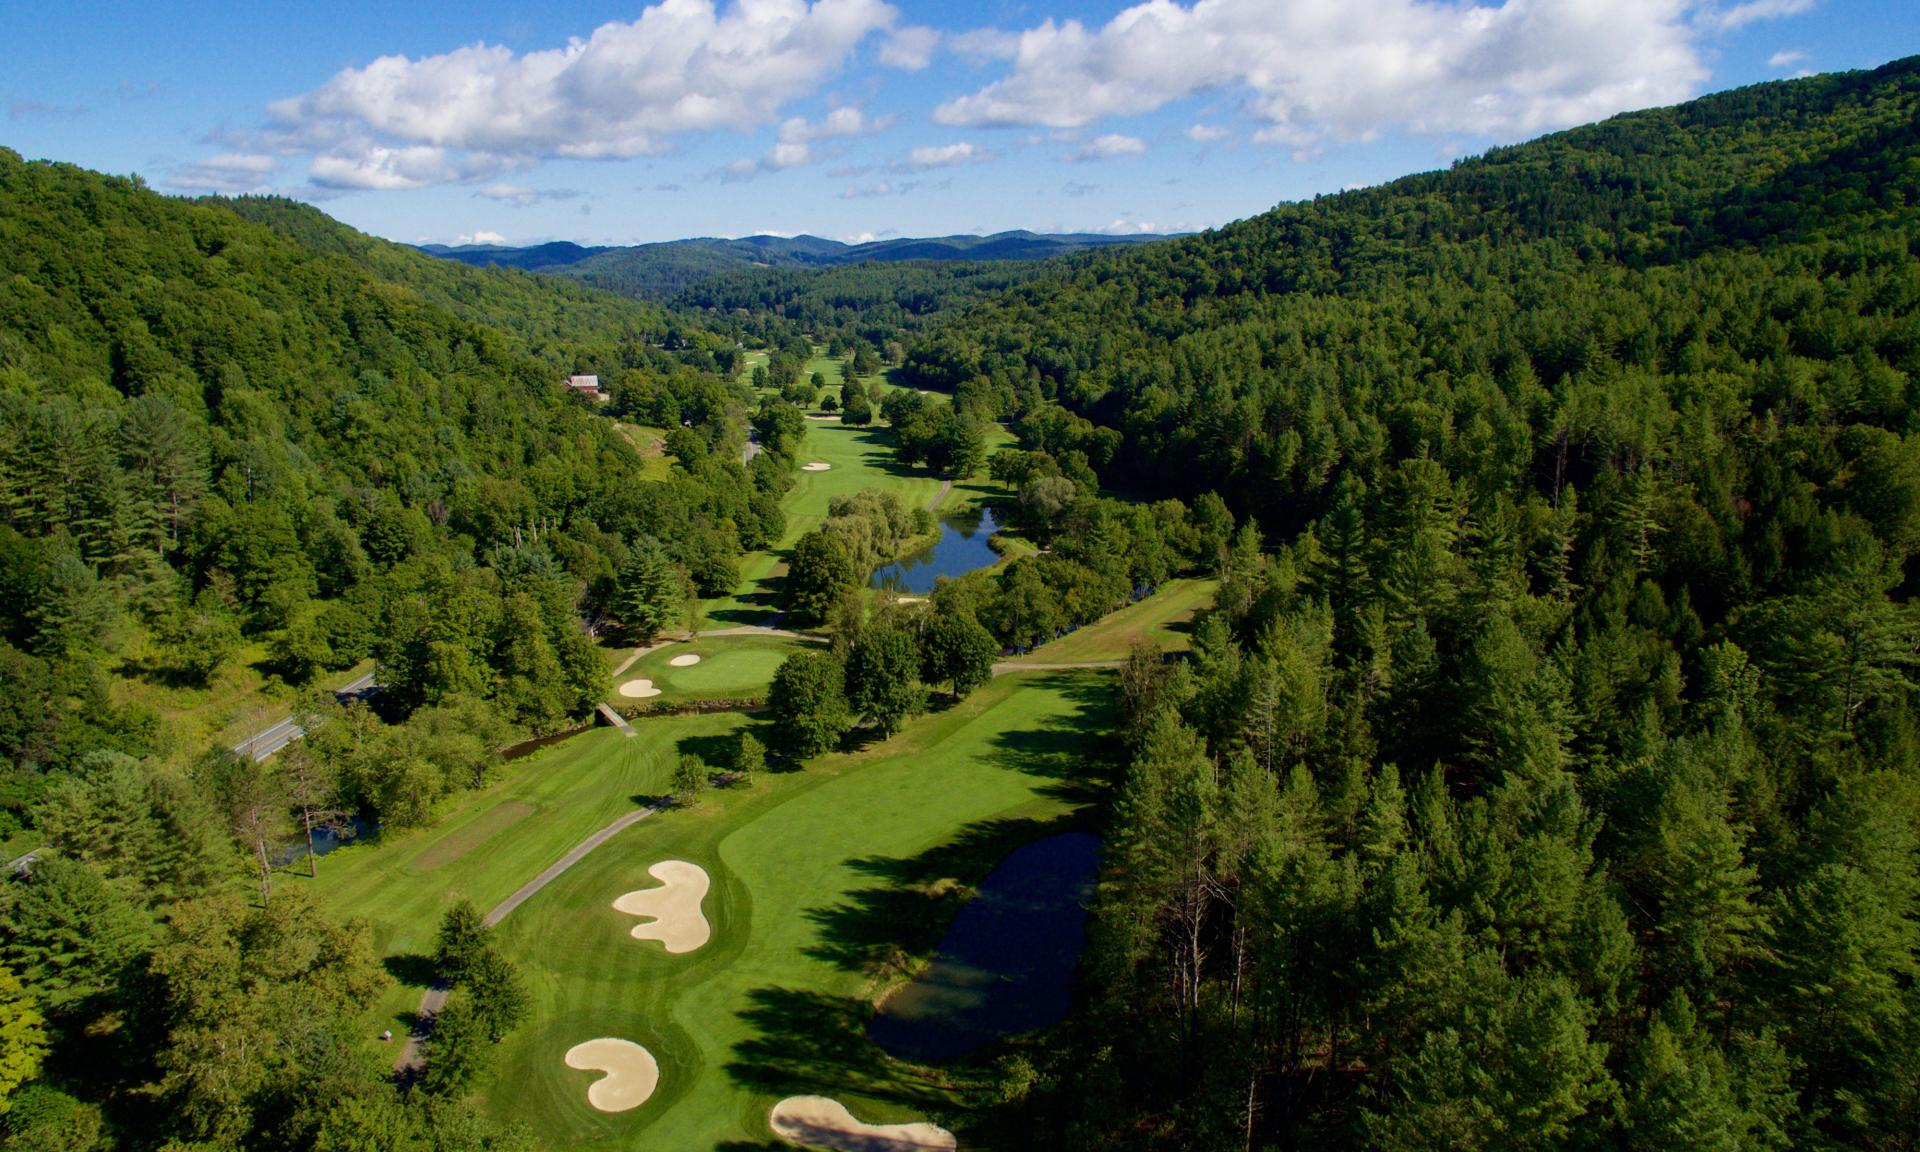 Woodstock Country Club | A Robert Trent Jones Golf Course